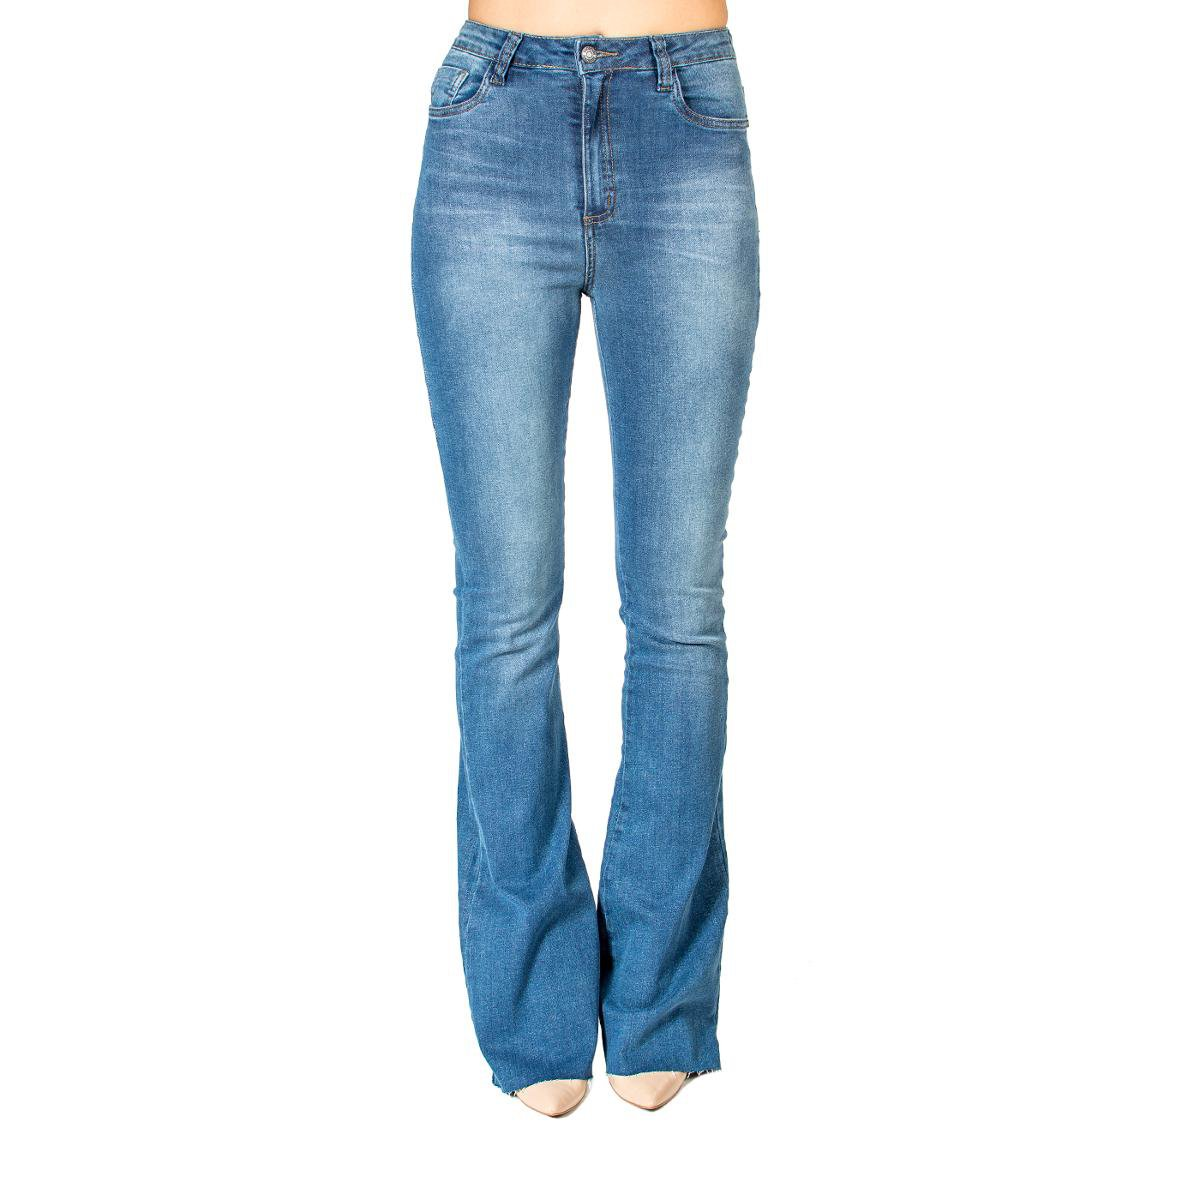 27a3603ee Calça Jeans Flare Barra Desfiada Handbook - Azul | Zattini